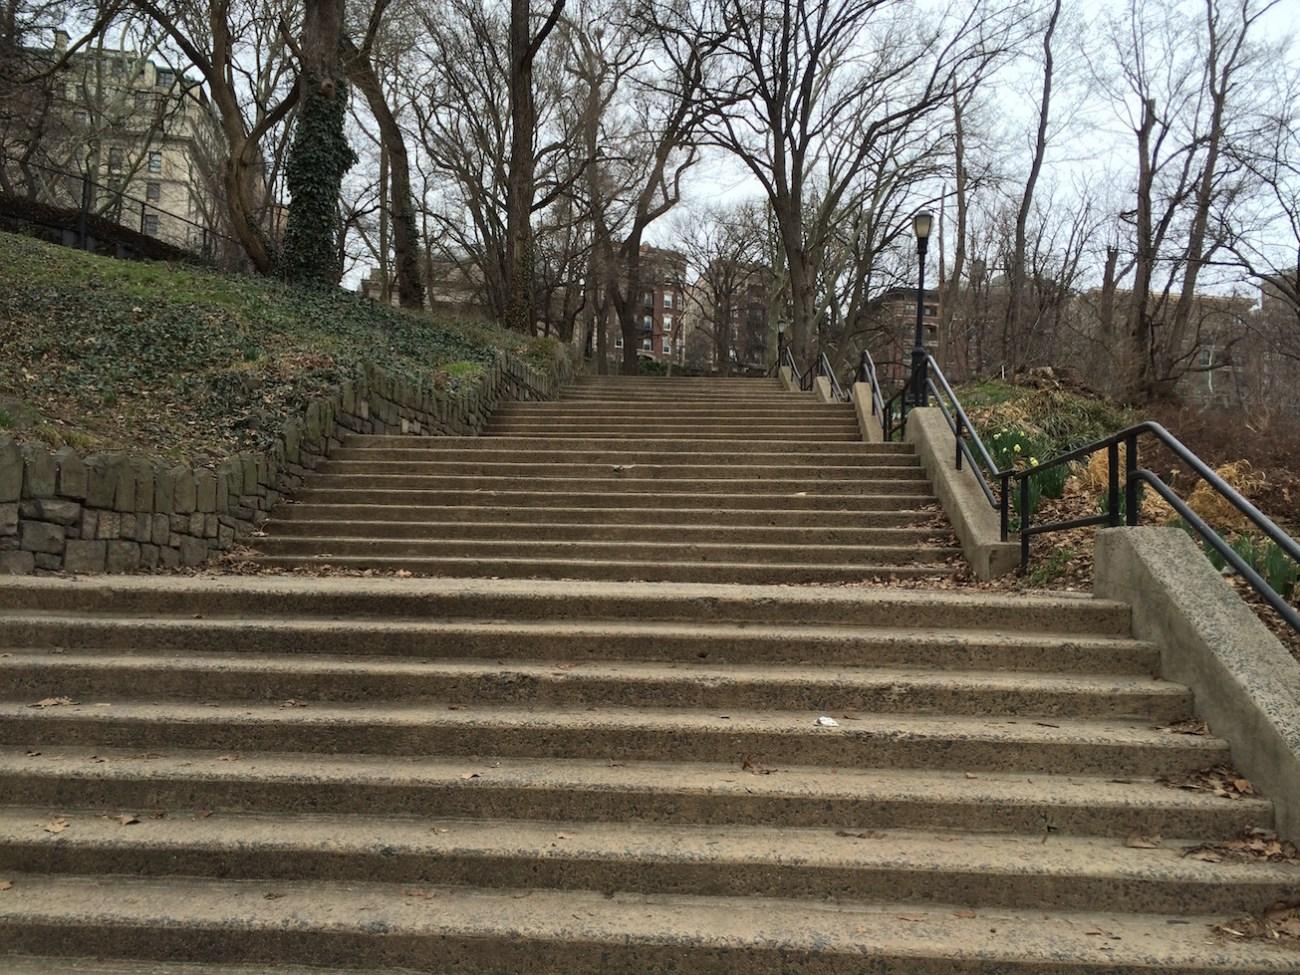 Morningside Park Stair Workout 18